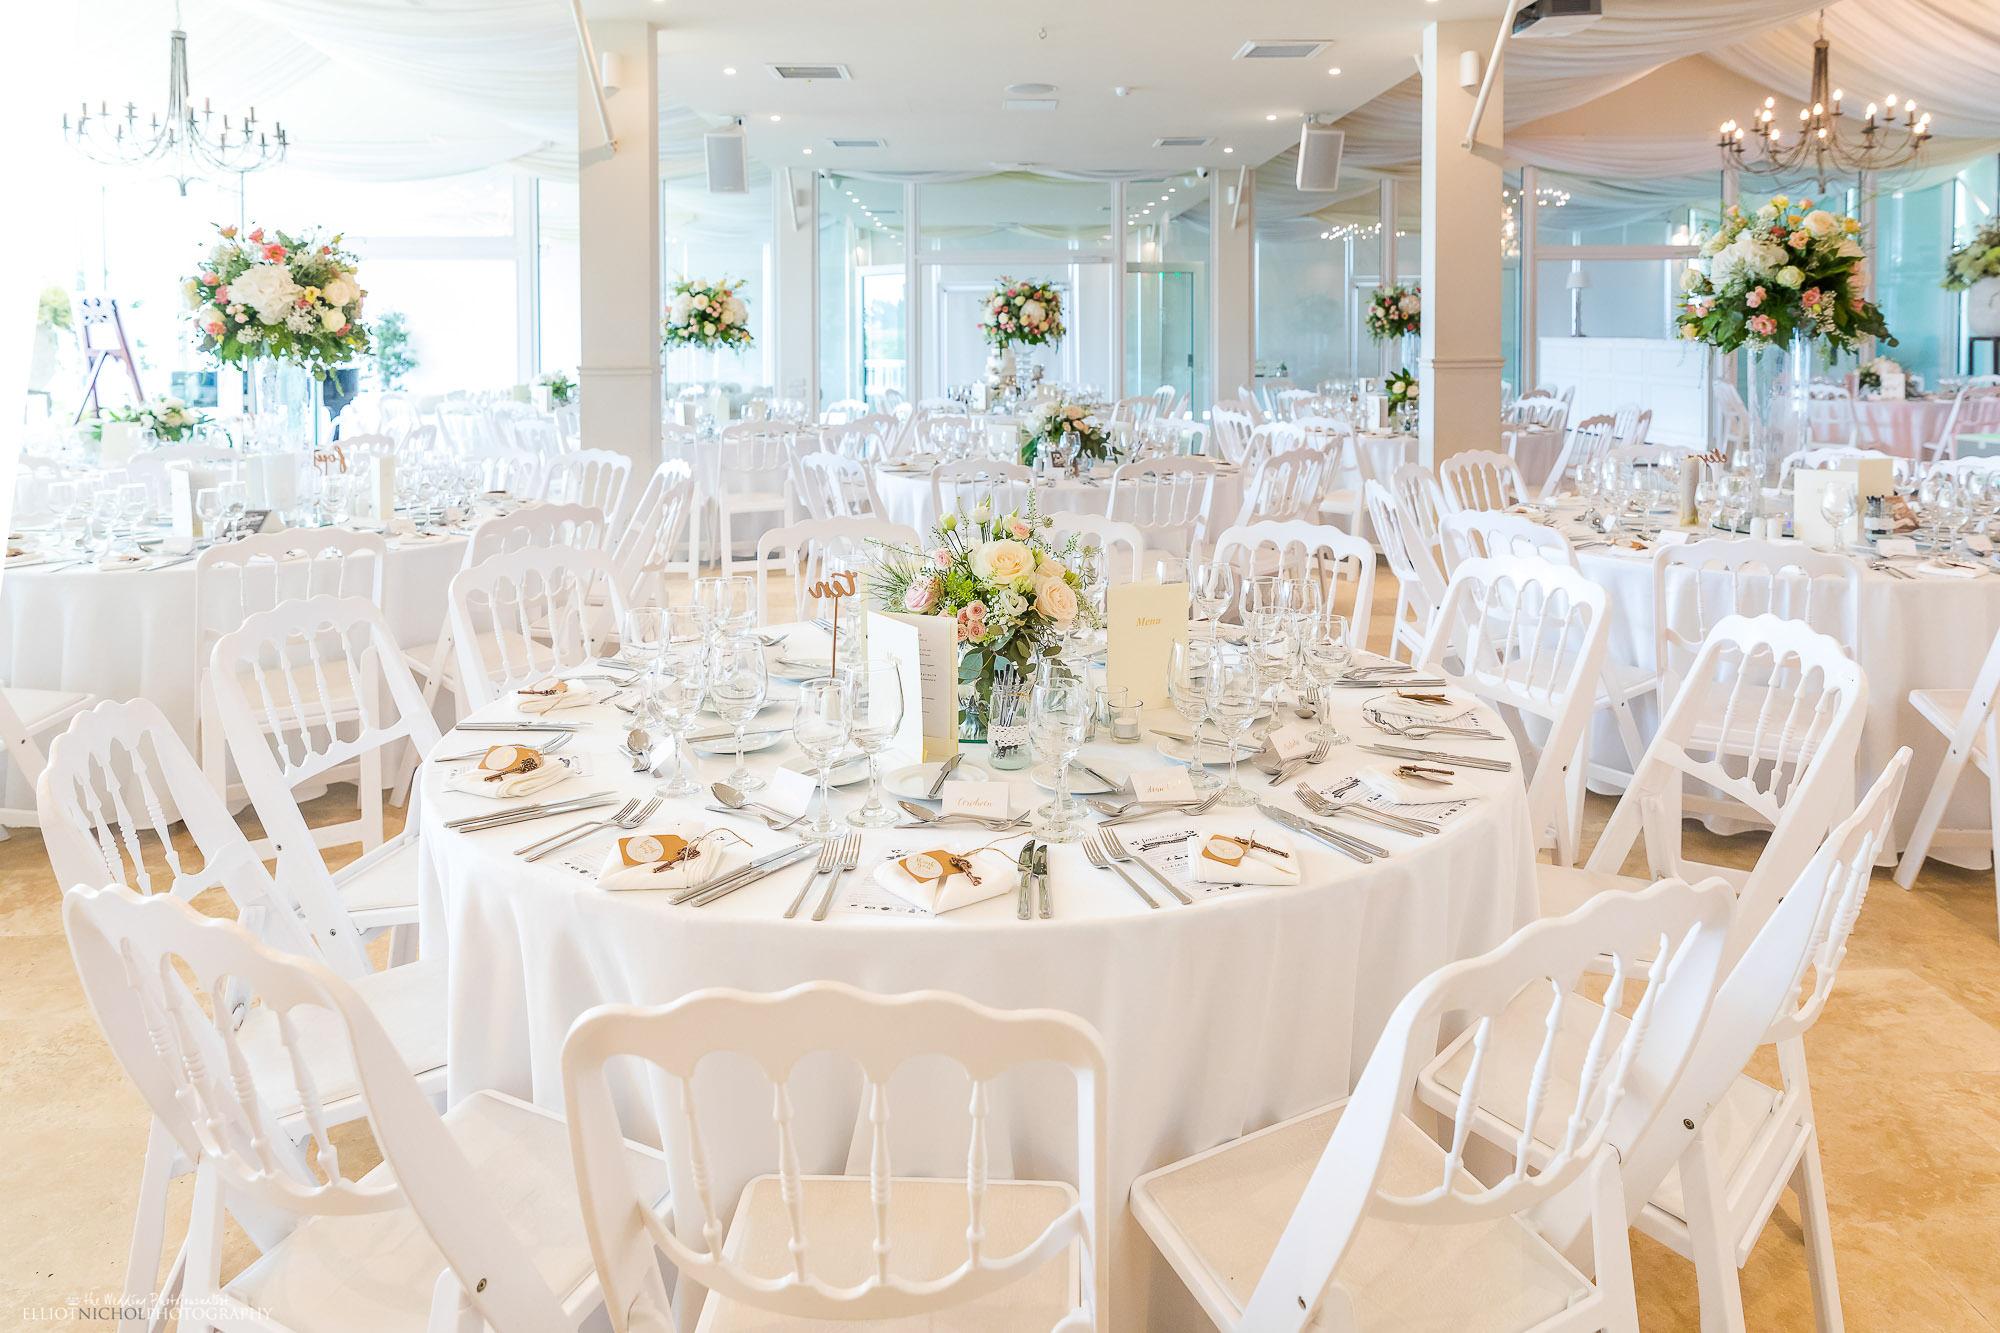 wedding-reception-setup-Villa-Arrigo-Malta